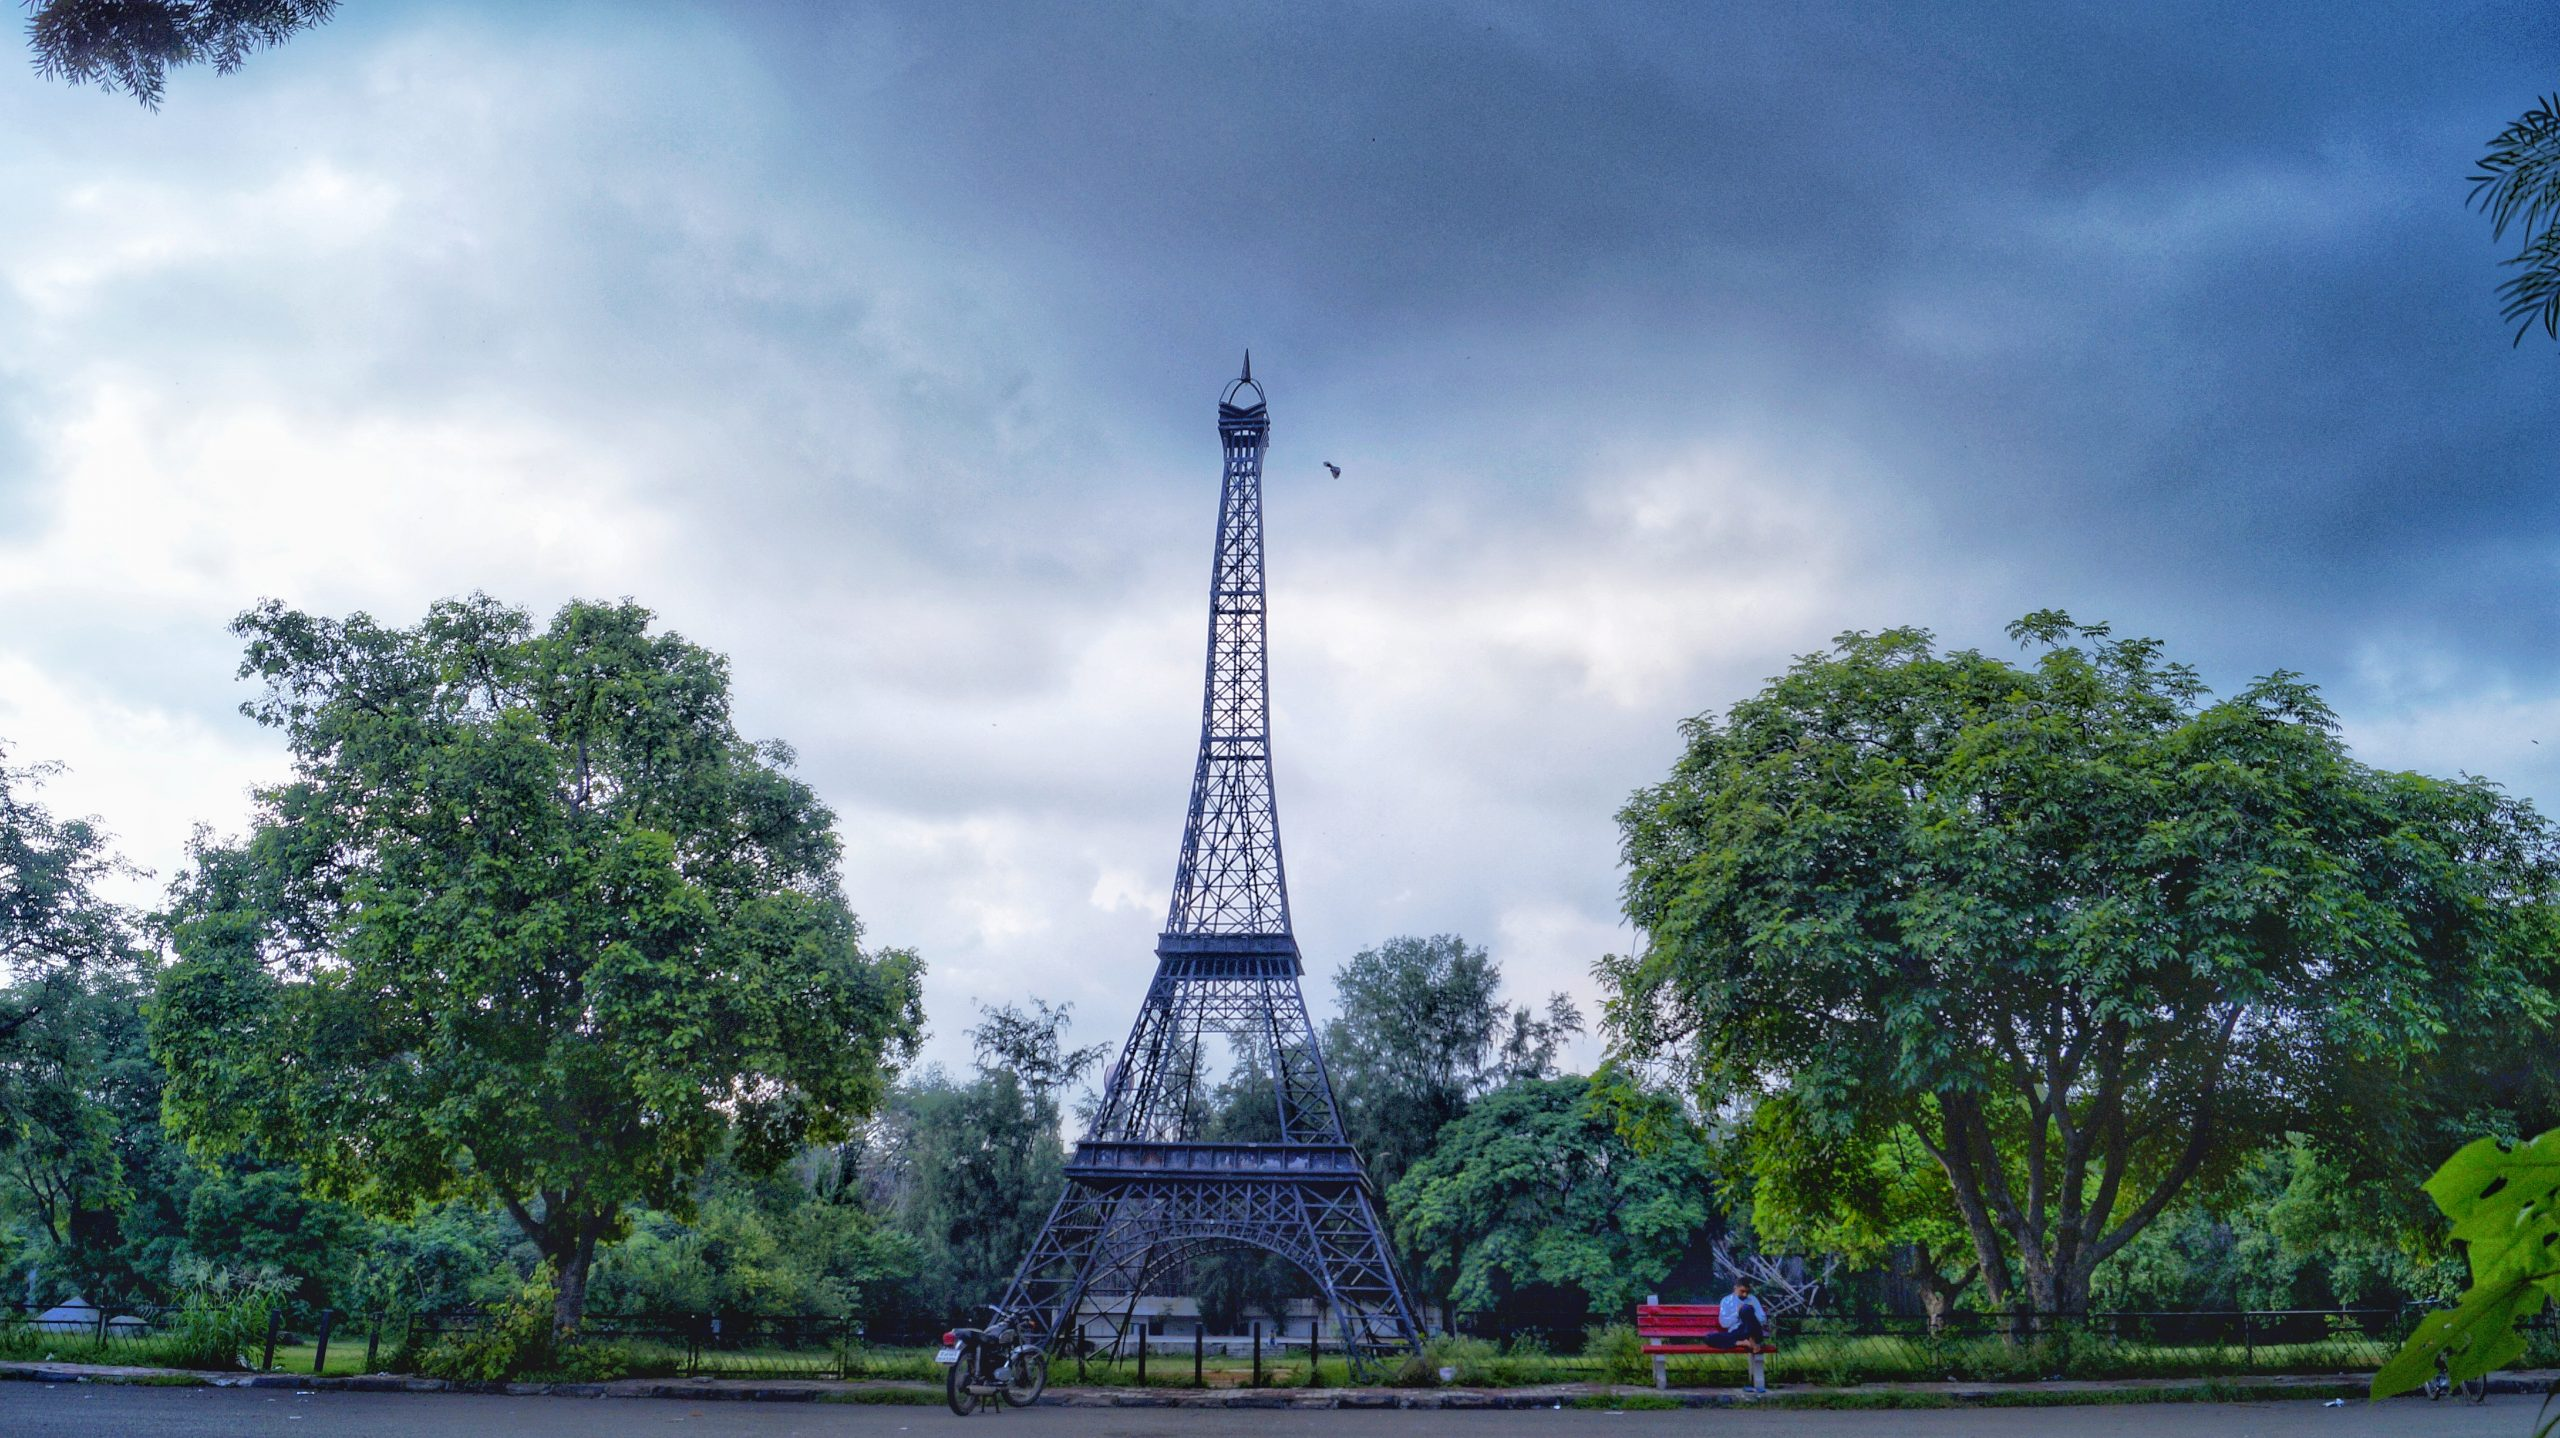 Eiffel Tower of Chandigarh